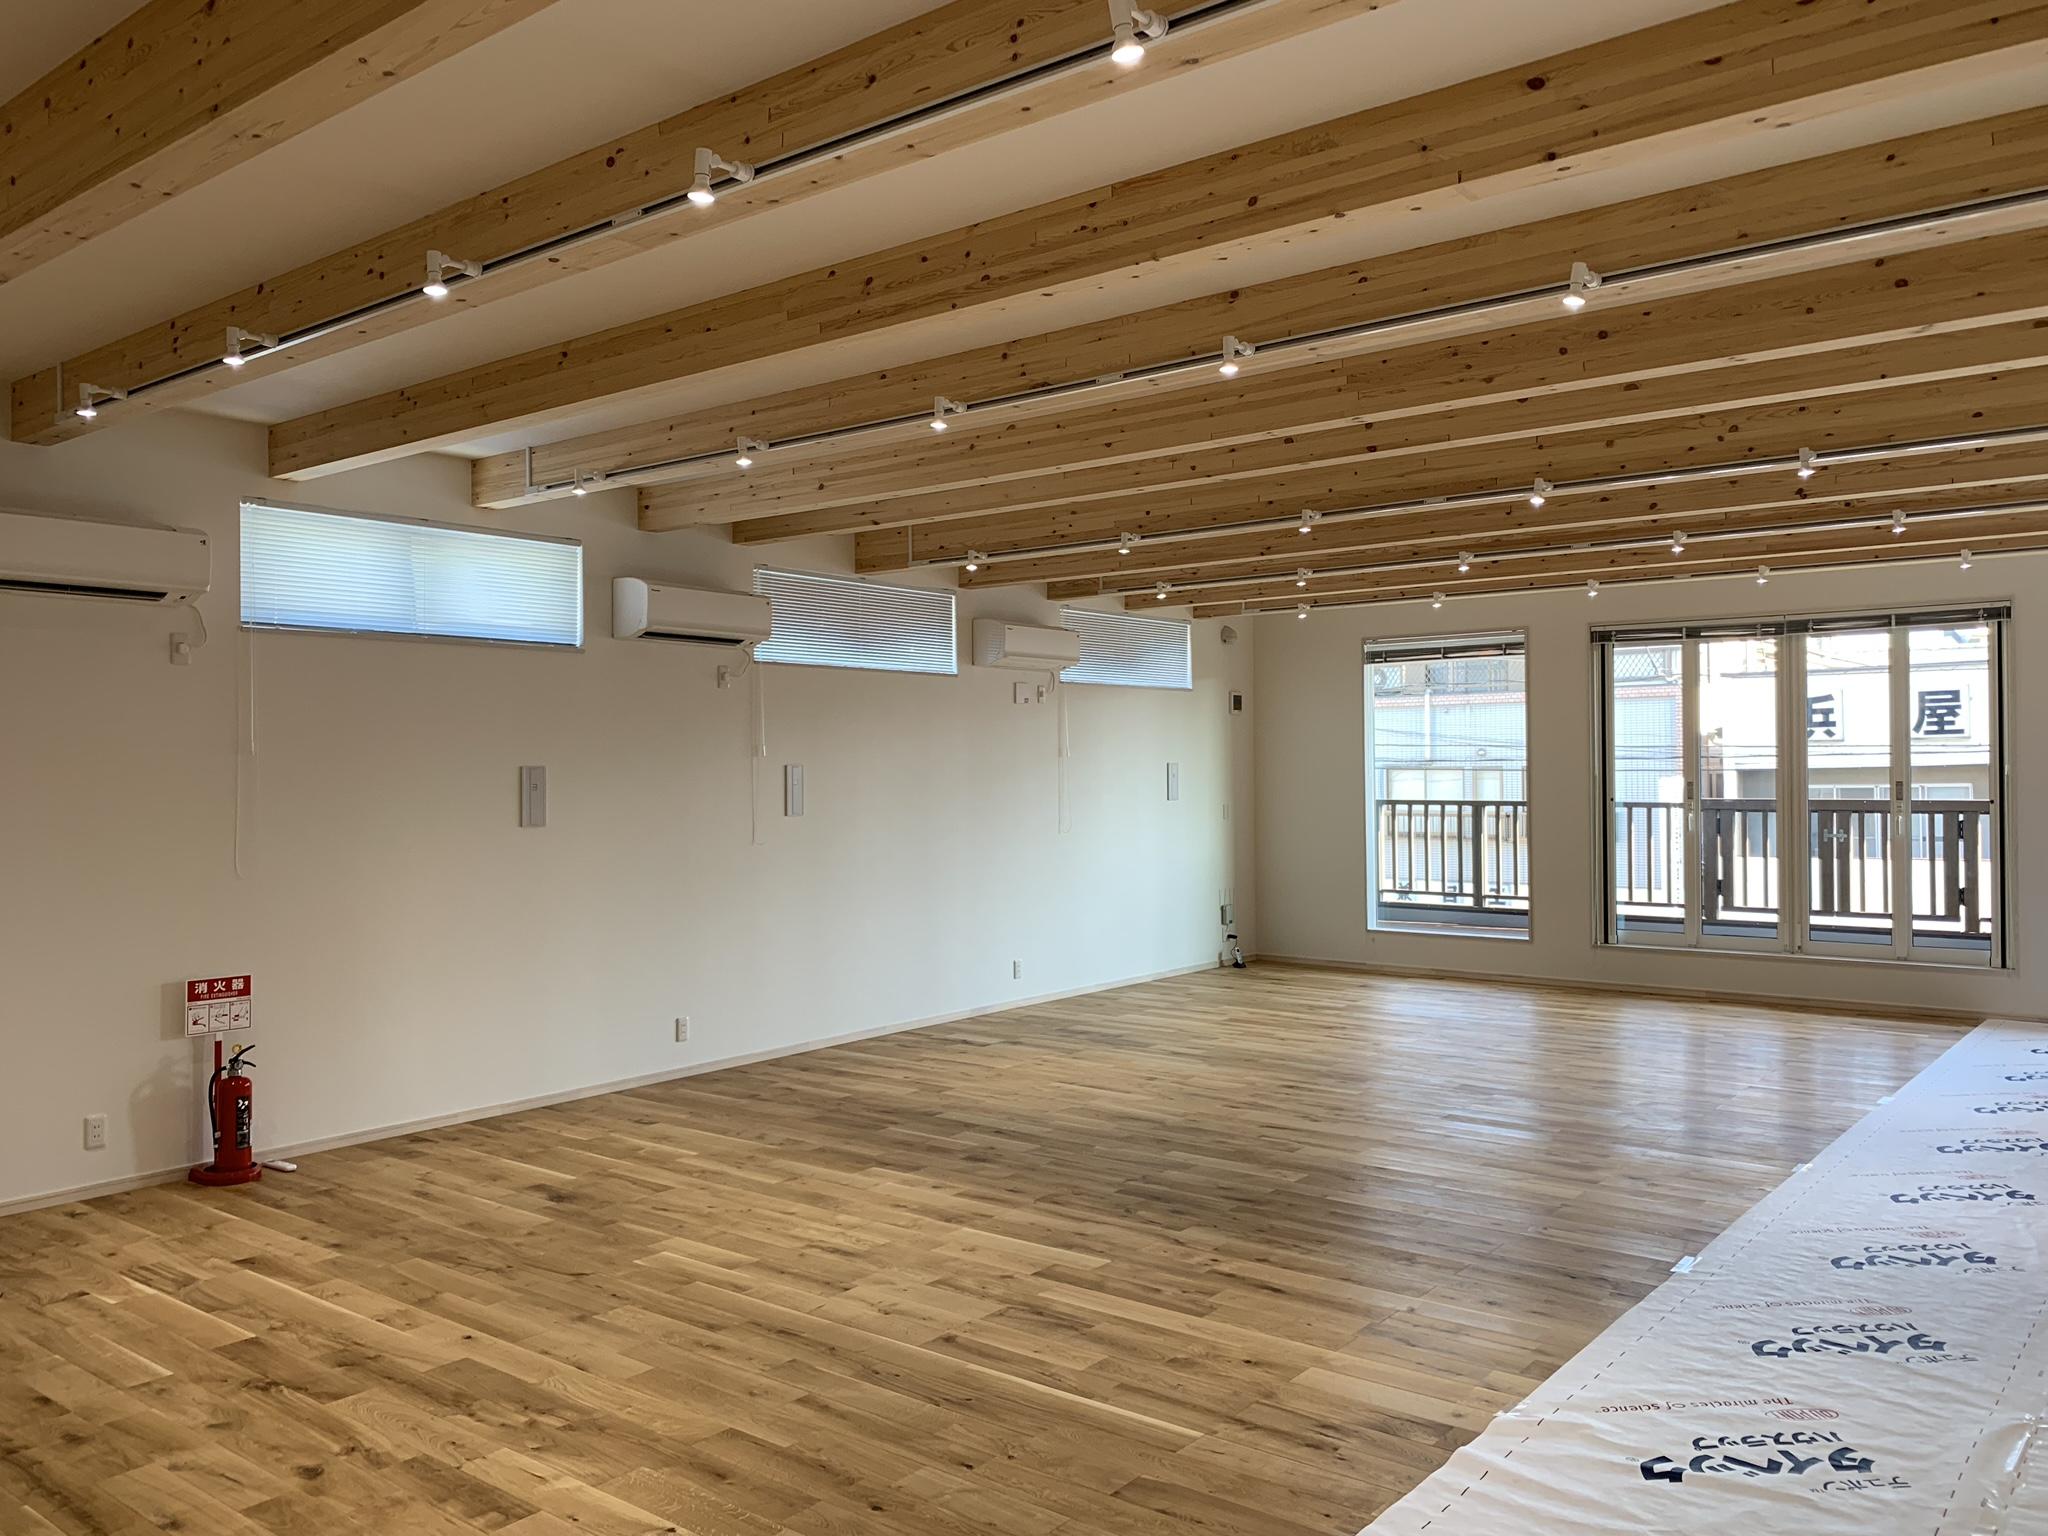 非住宅建築物の木造化、木質化の流れ